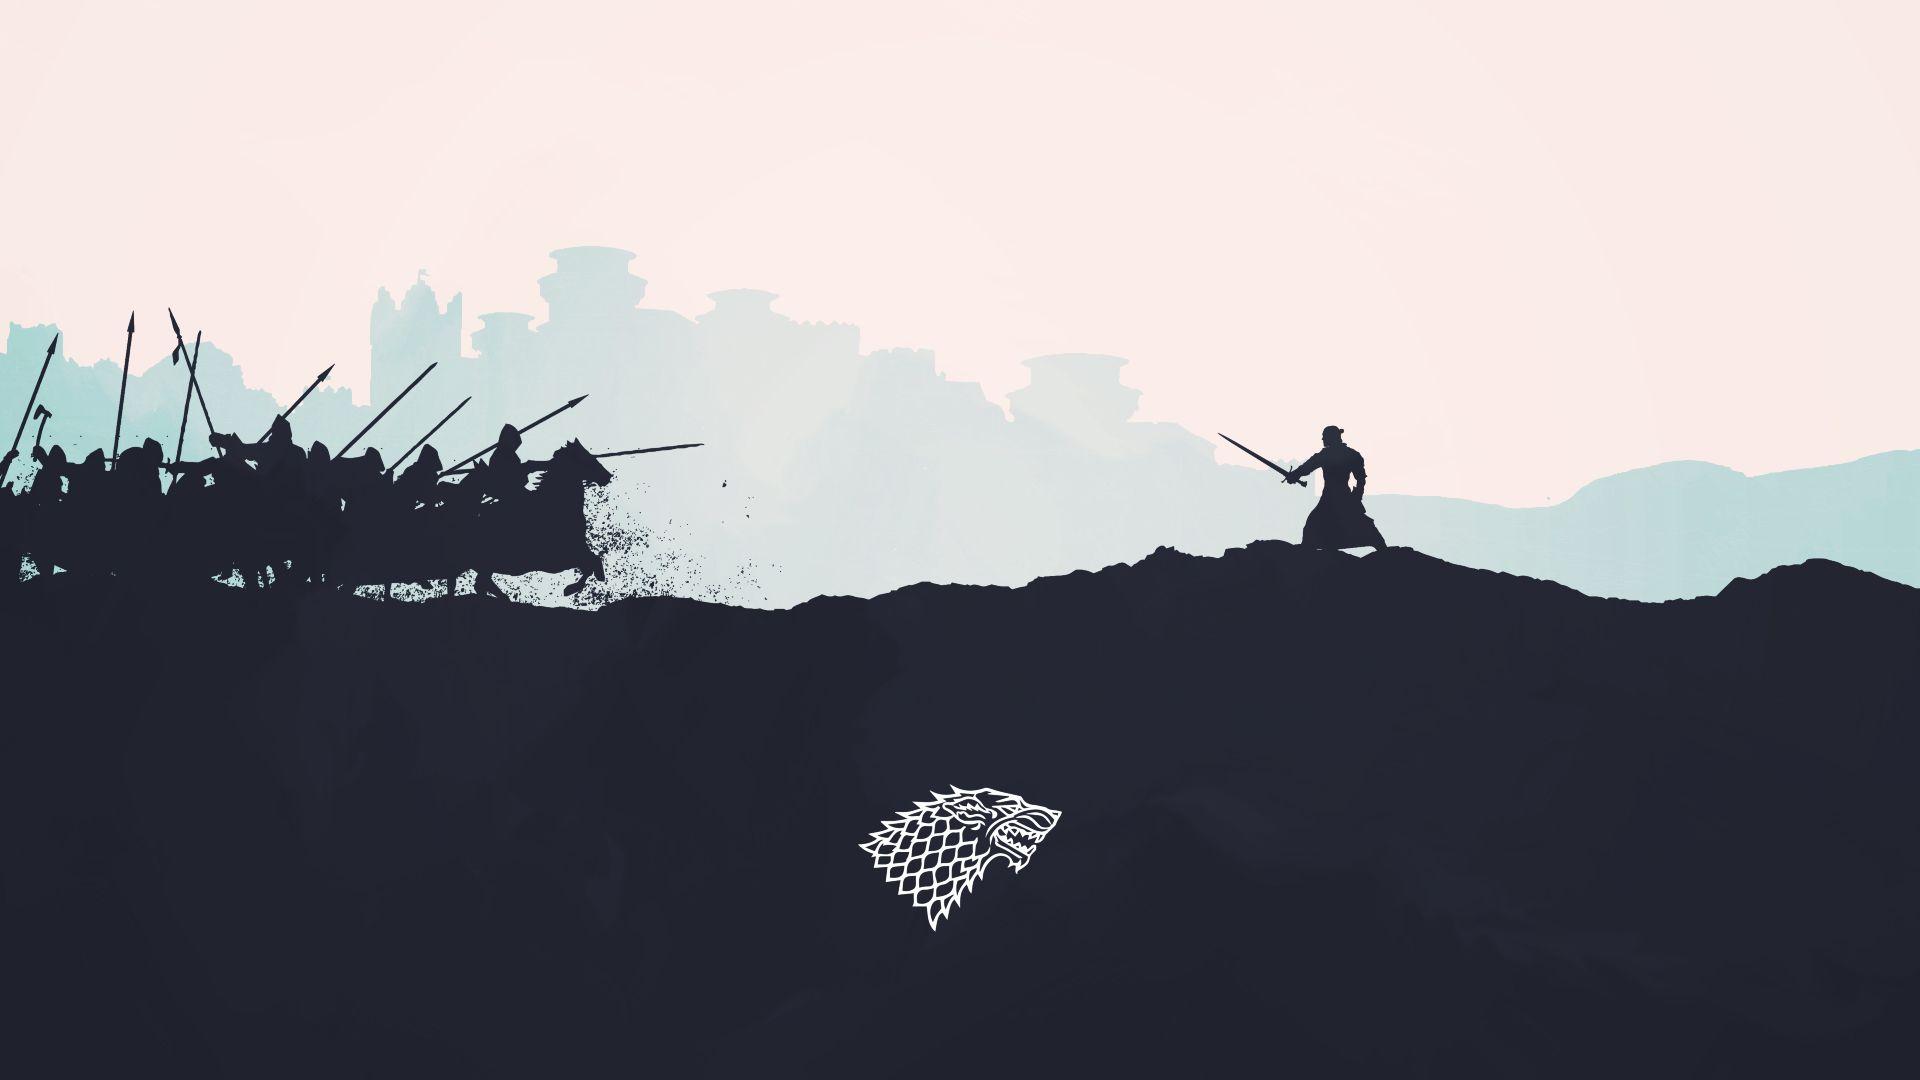 1080p Minimalist Wallpapers Wallpaper Cave